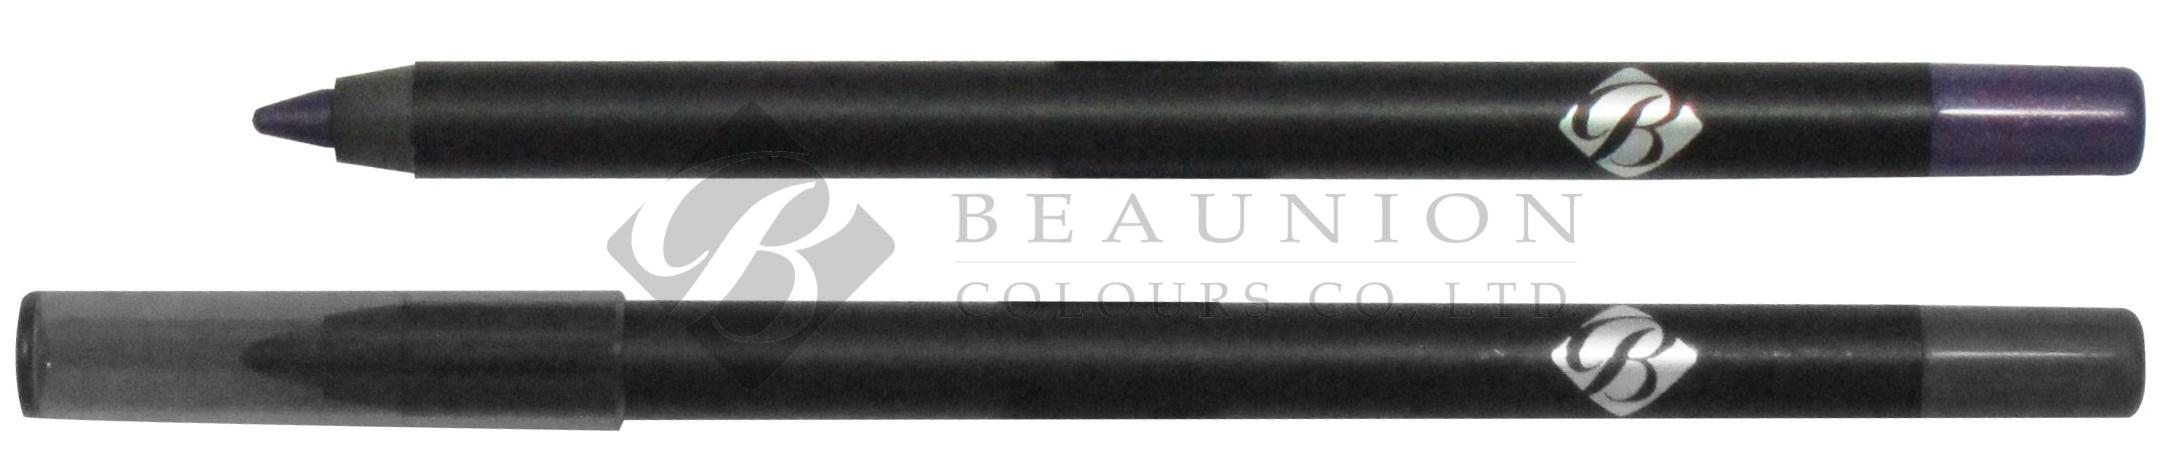 SA-008 Eyeliner / Lip Liner Pencil / Gel Eyeliner